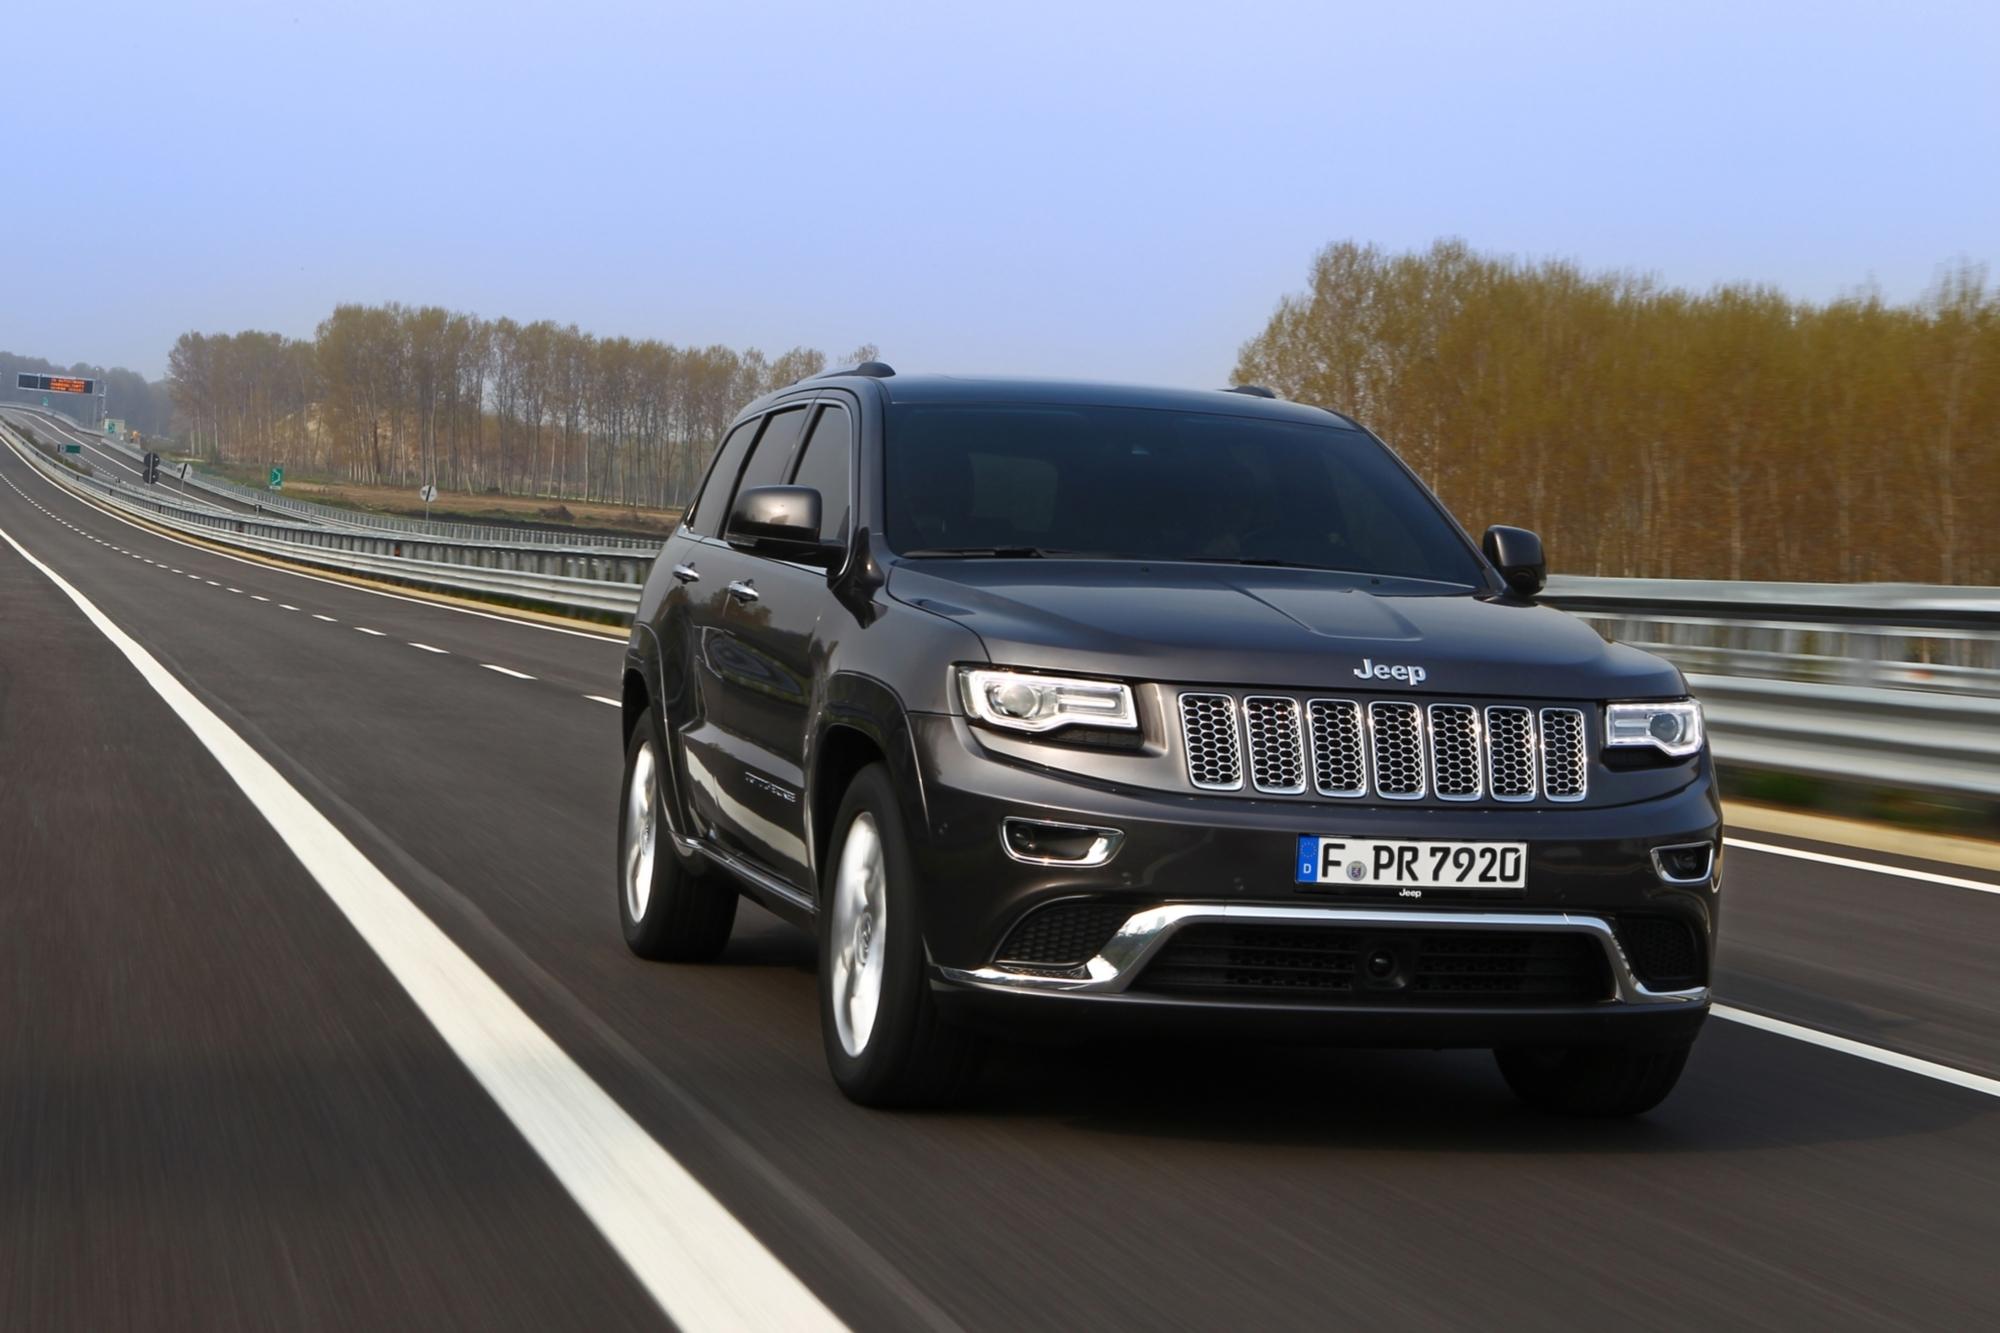 Fahrbericht: Jeep Grand Cherokee - Acht statt fünf